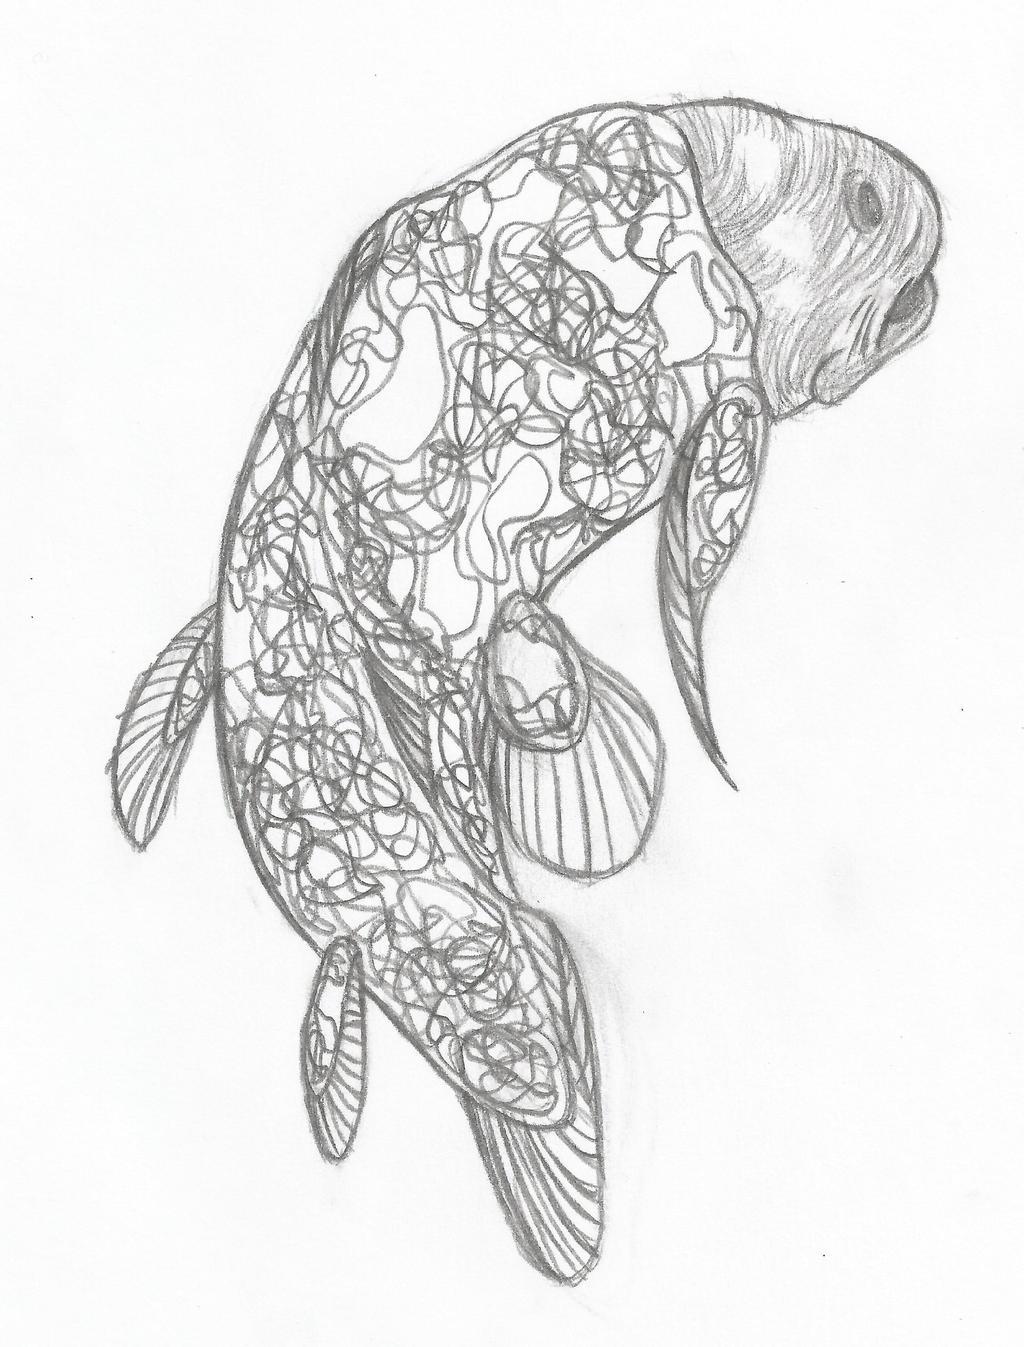 Coelacanth by Dragimal